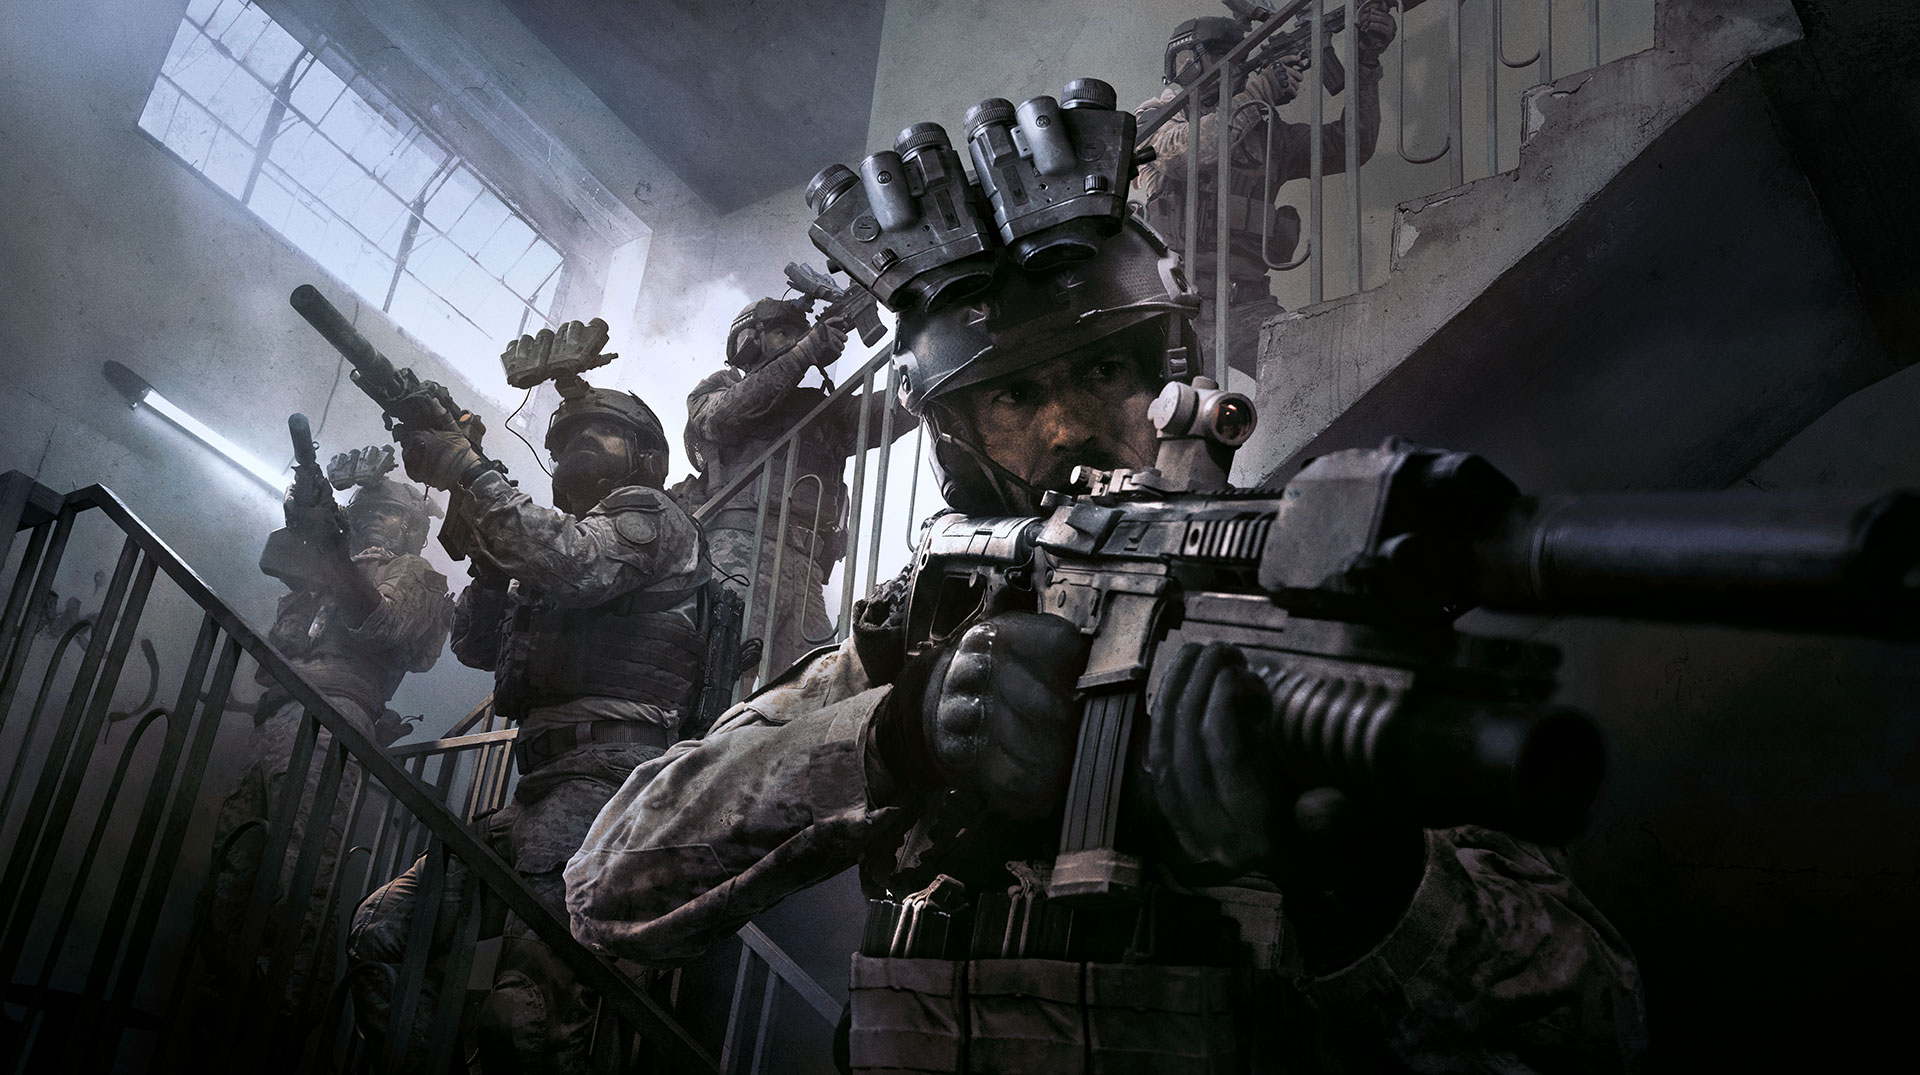 Call of Duty 1382019 1